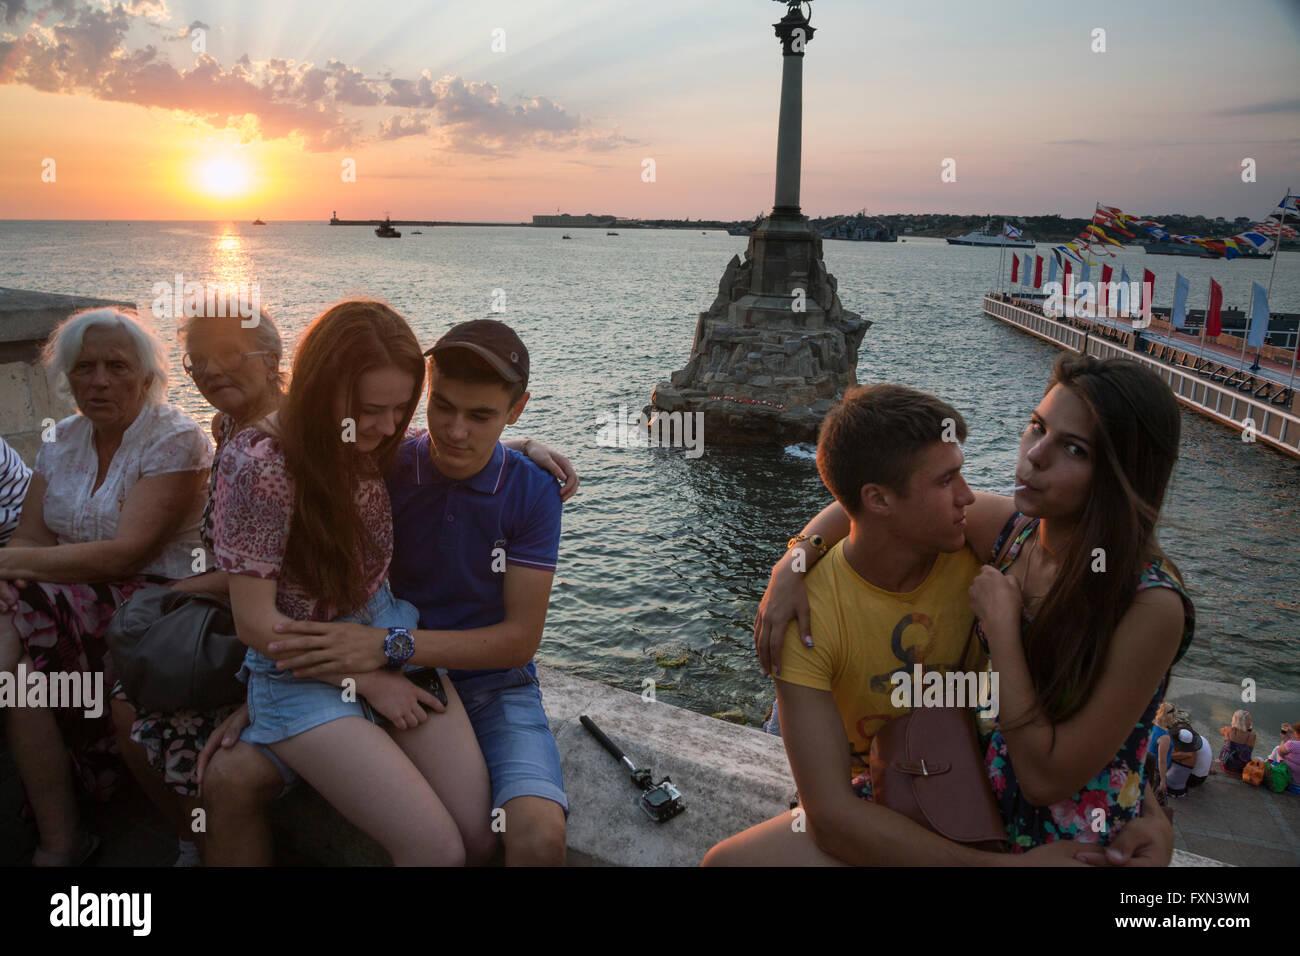 People enjoying at sunset near the Sunken Ships memorial, iconic monument and landmark in Sevastopol, Crimea Republic - Stock Image